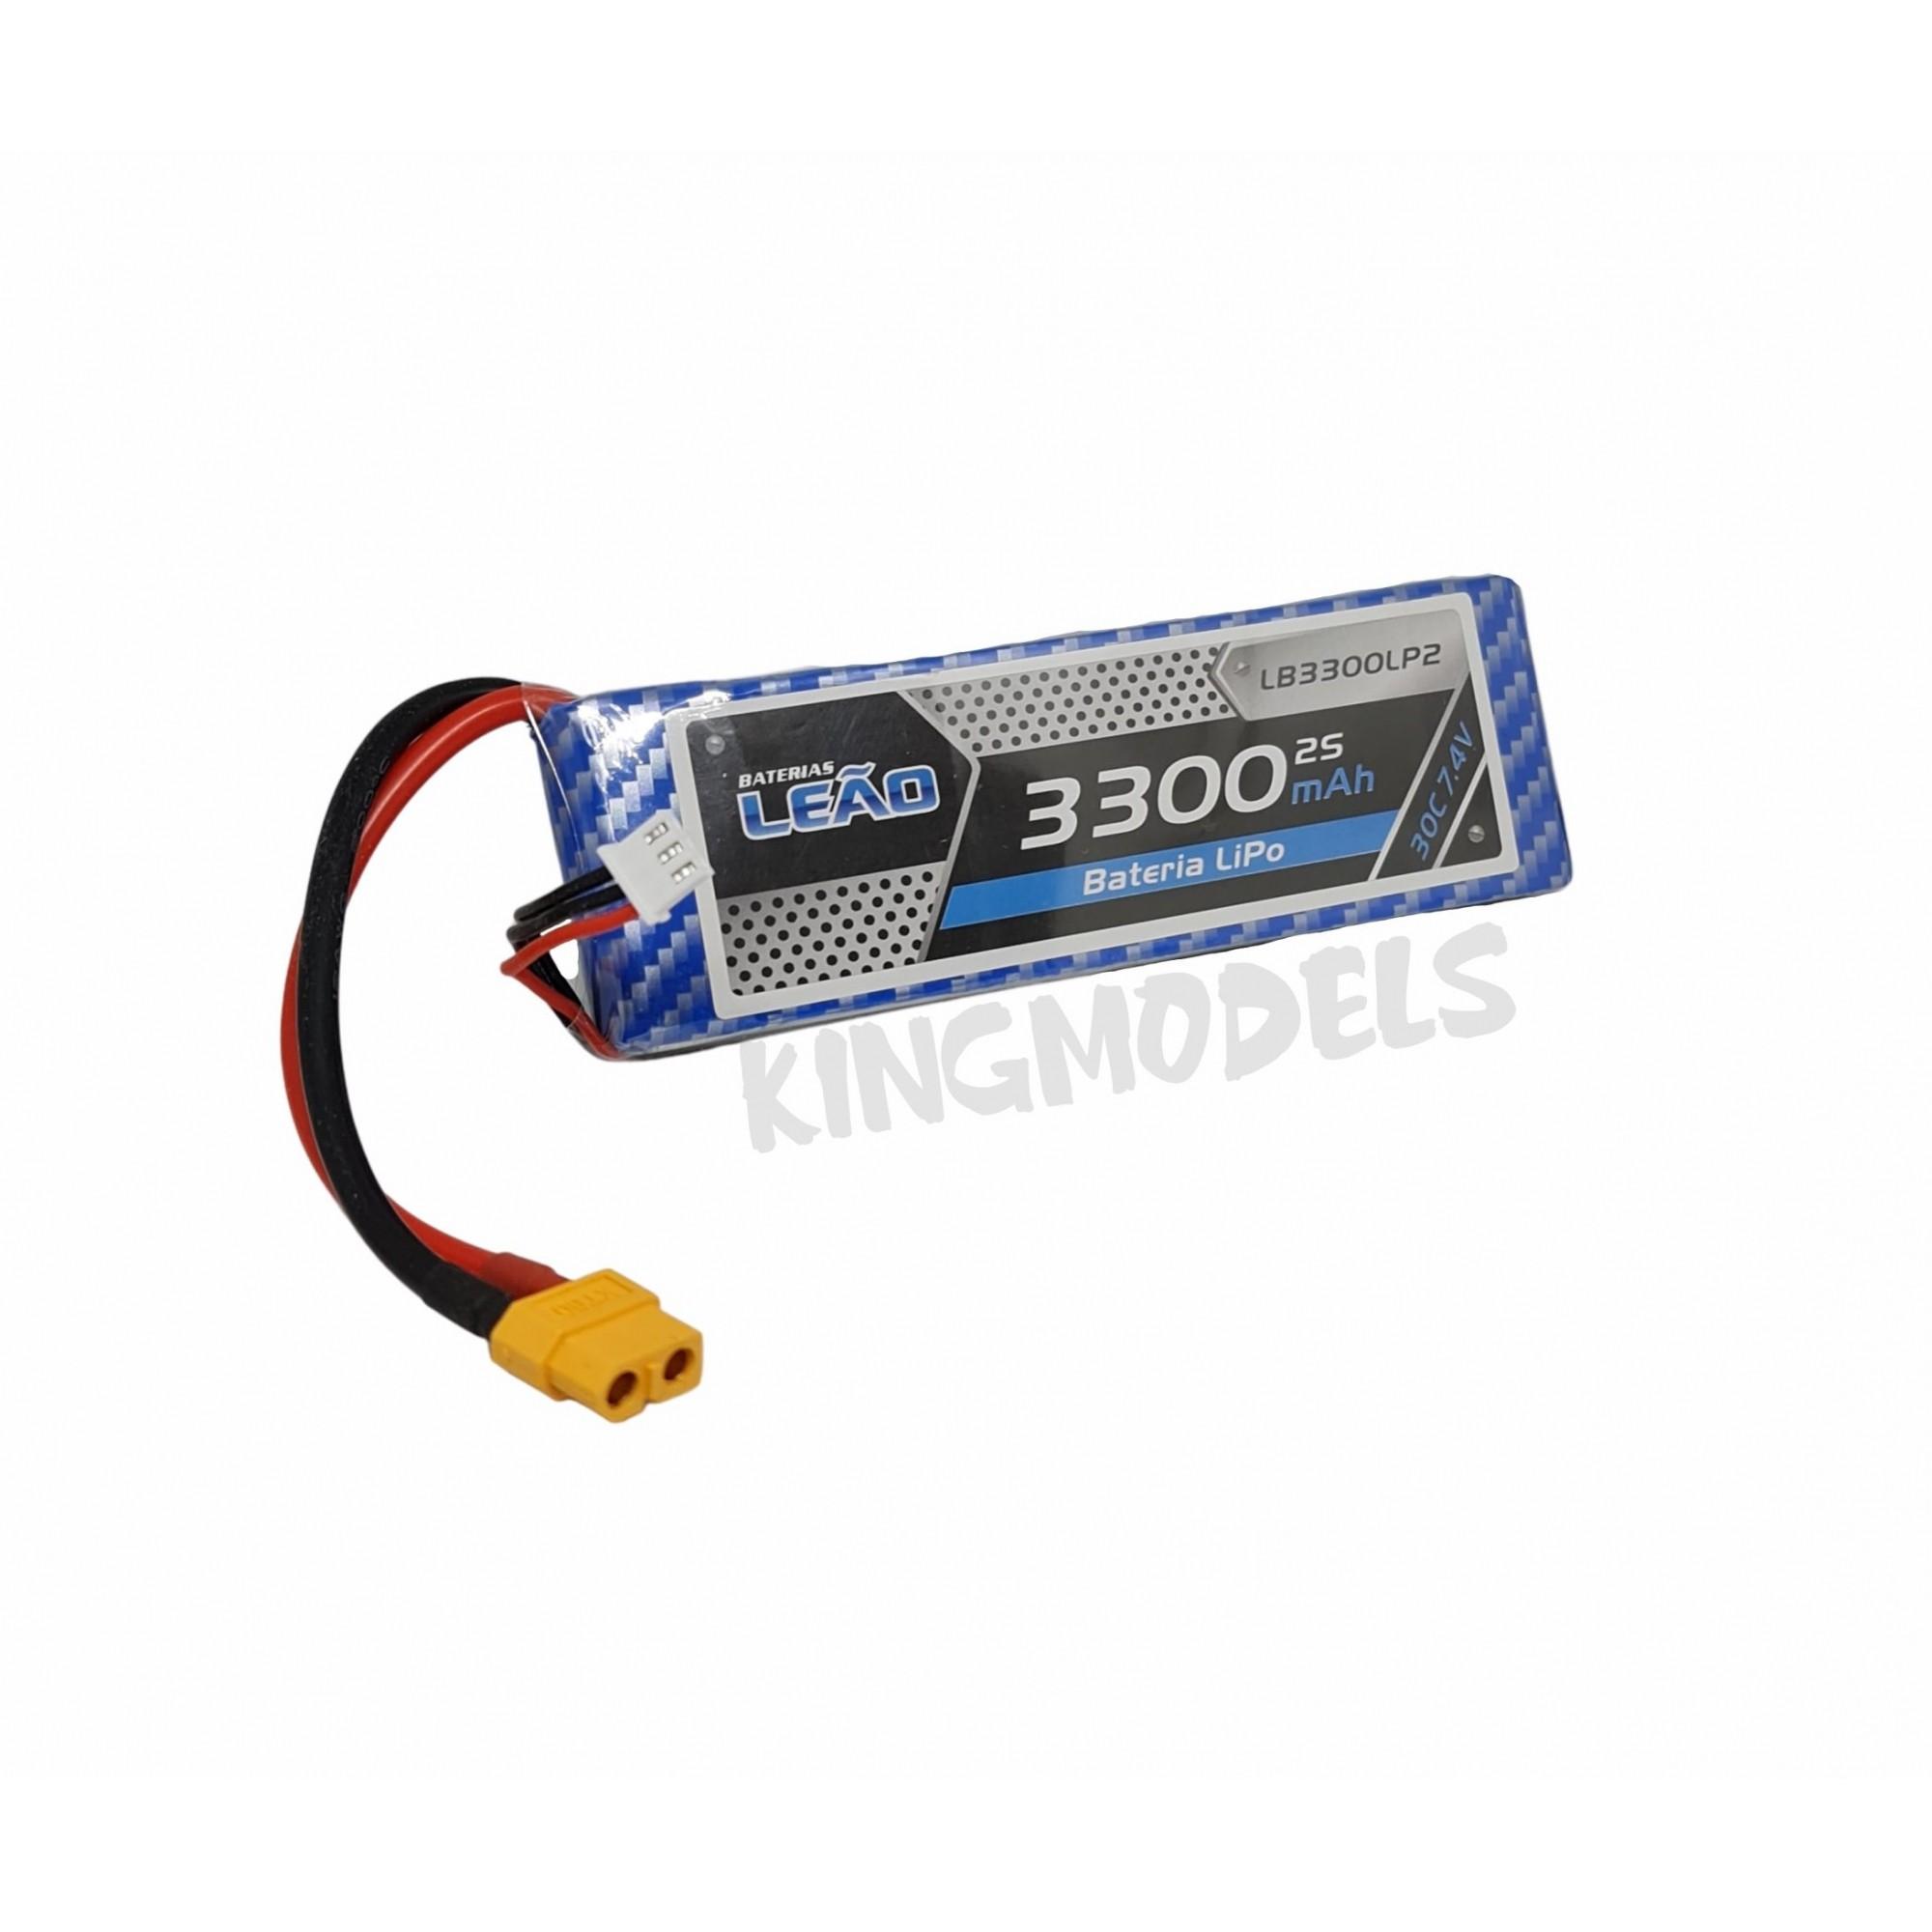 Bateria Lipo Leão 2s 7.4v - 3300mah - 30/60c  - King Models